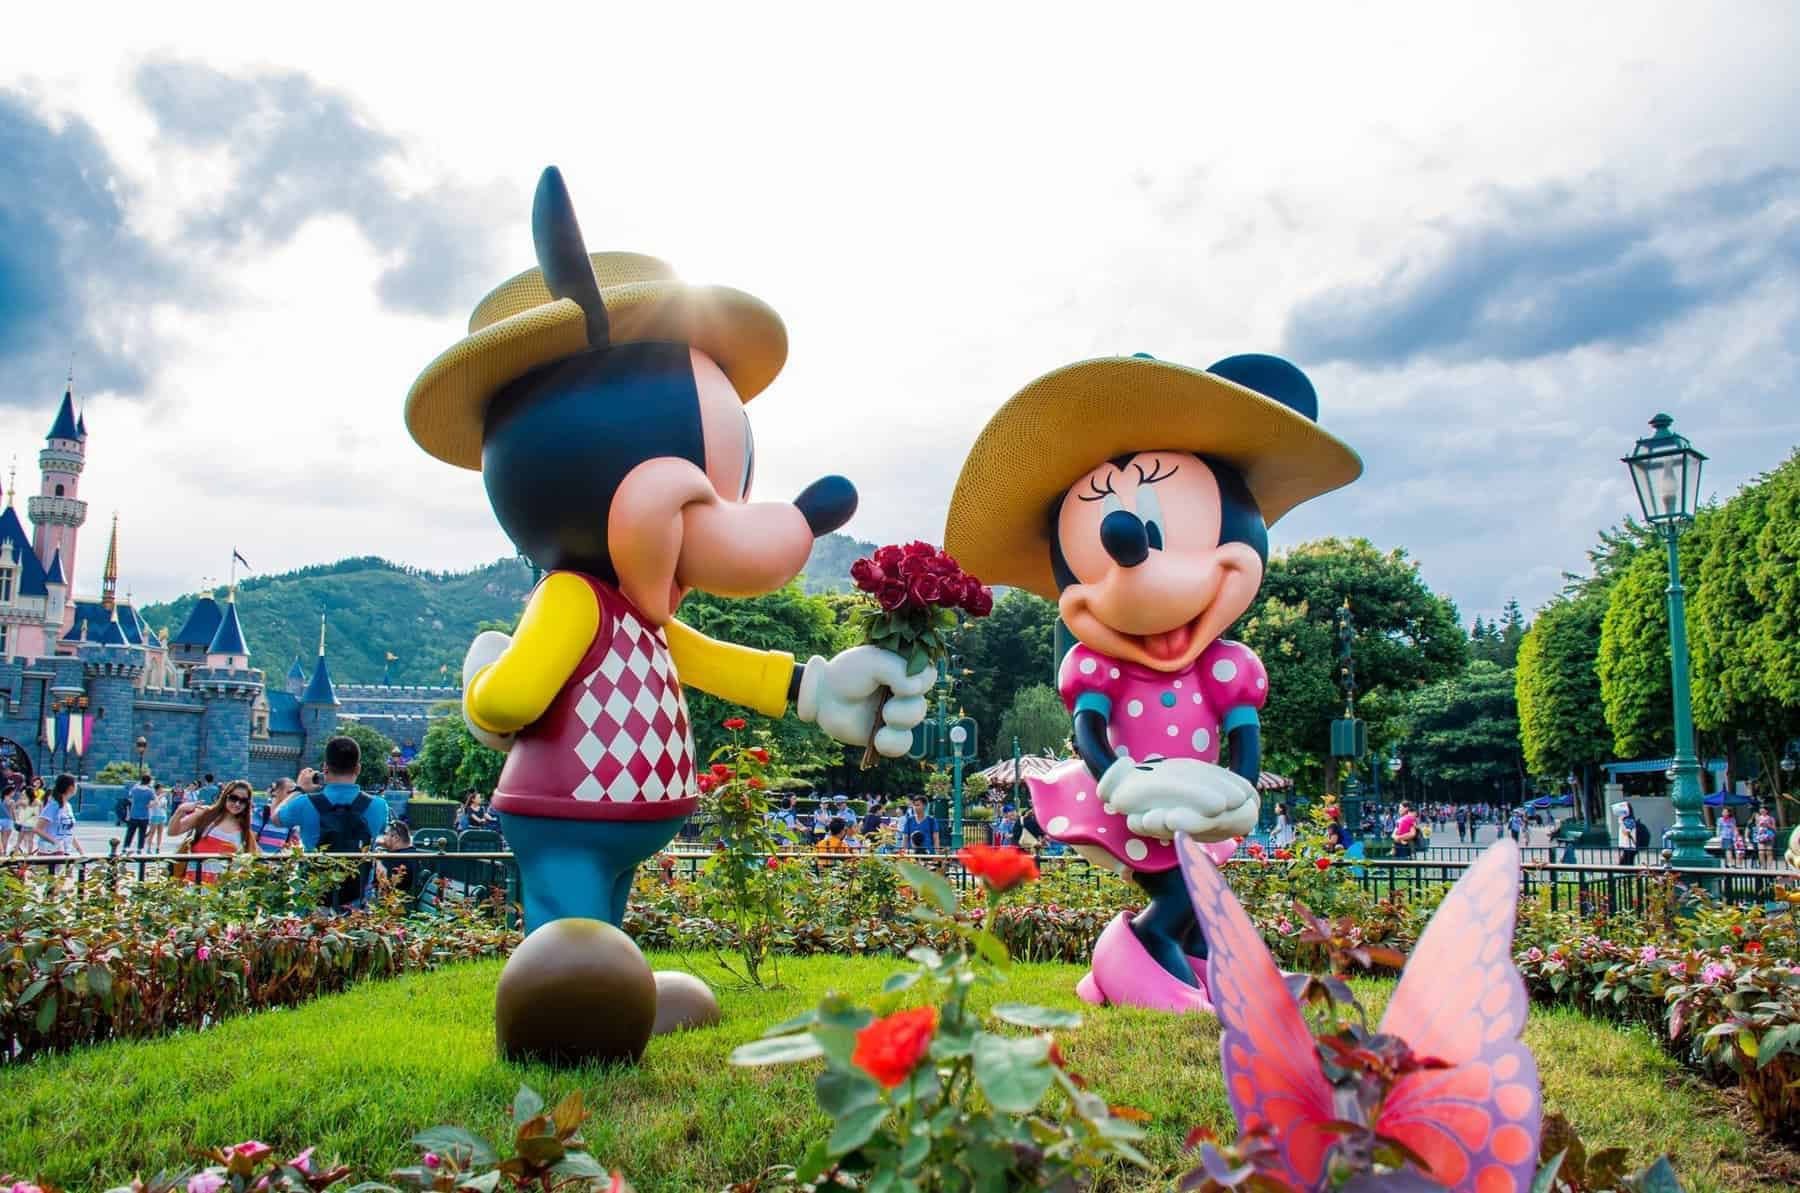 Mickey & Minnie in Disland Hong Kong